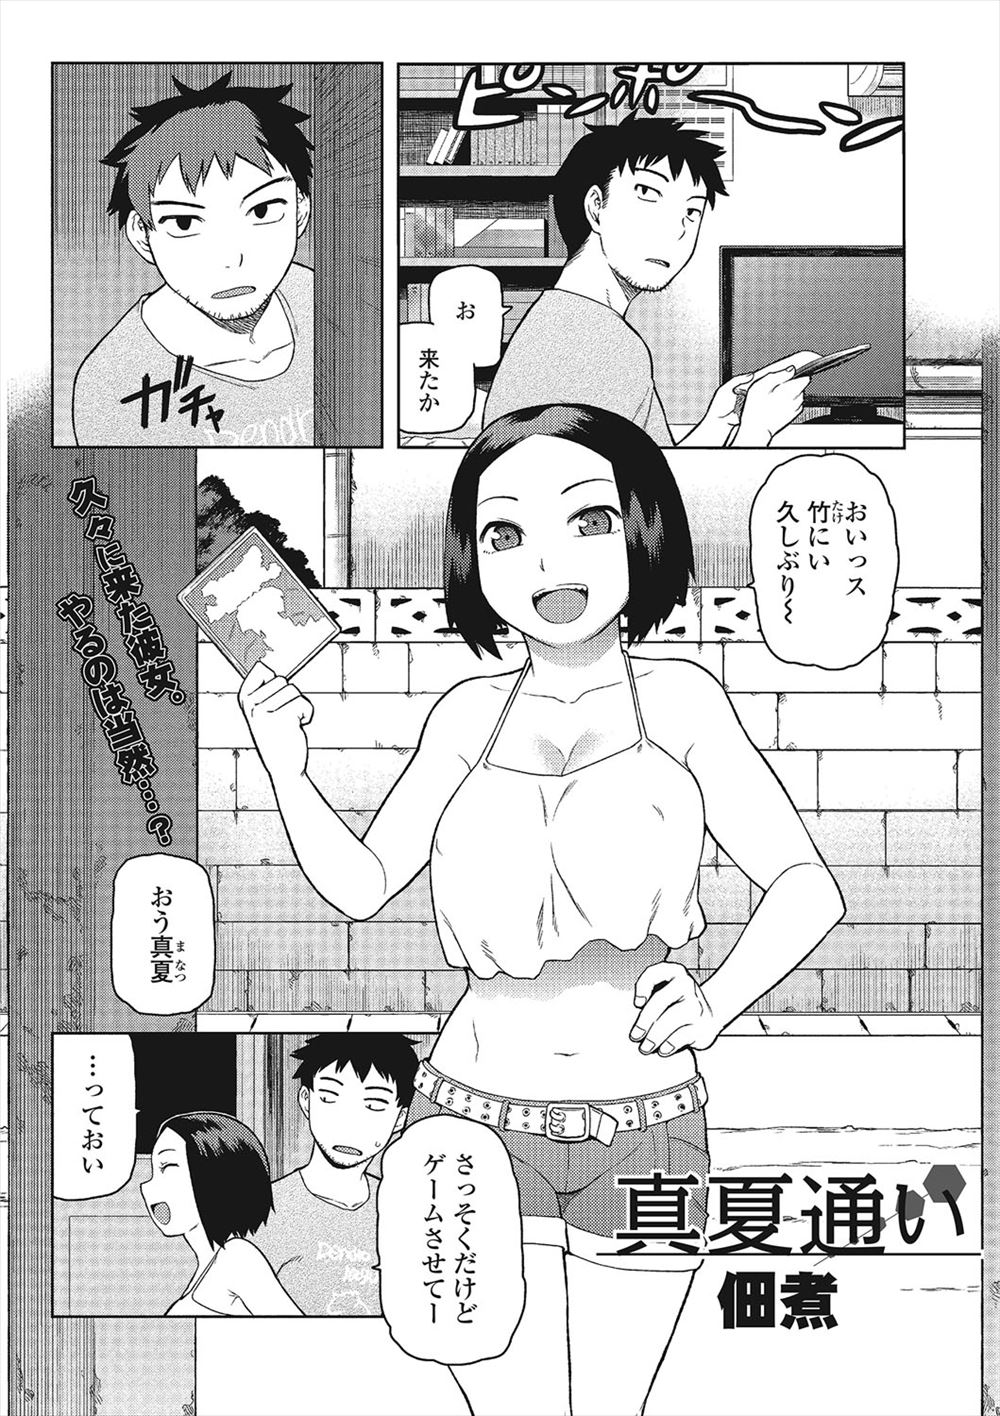 [佃煮] 真夏通い (1)